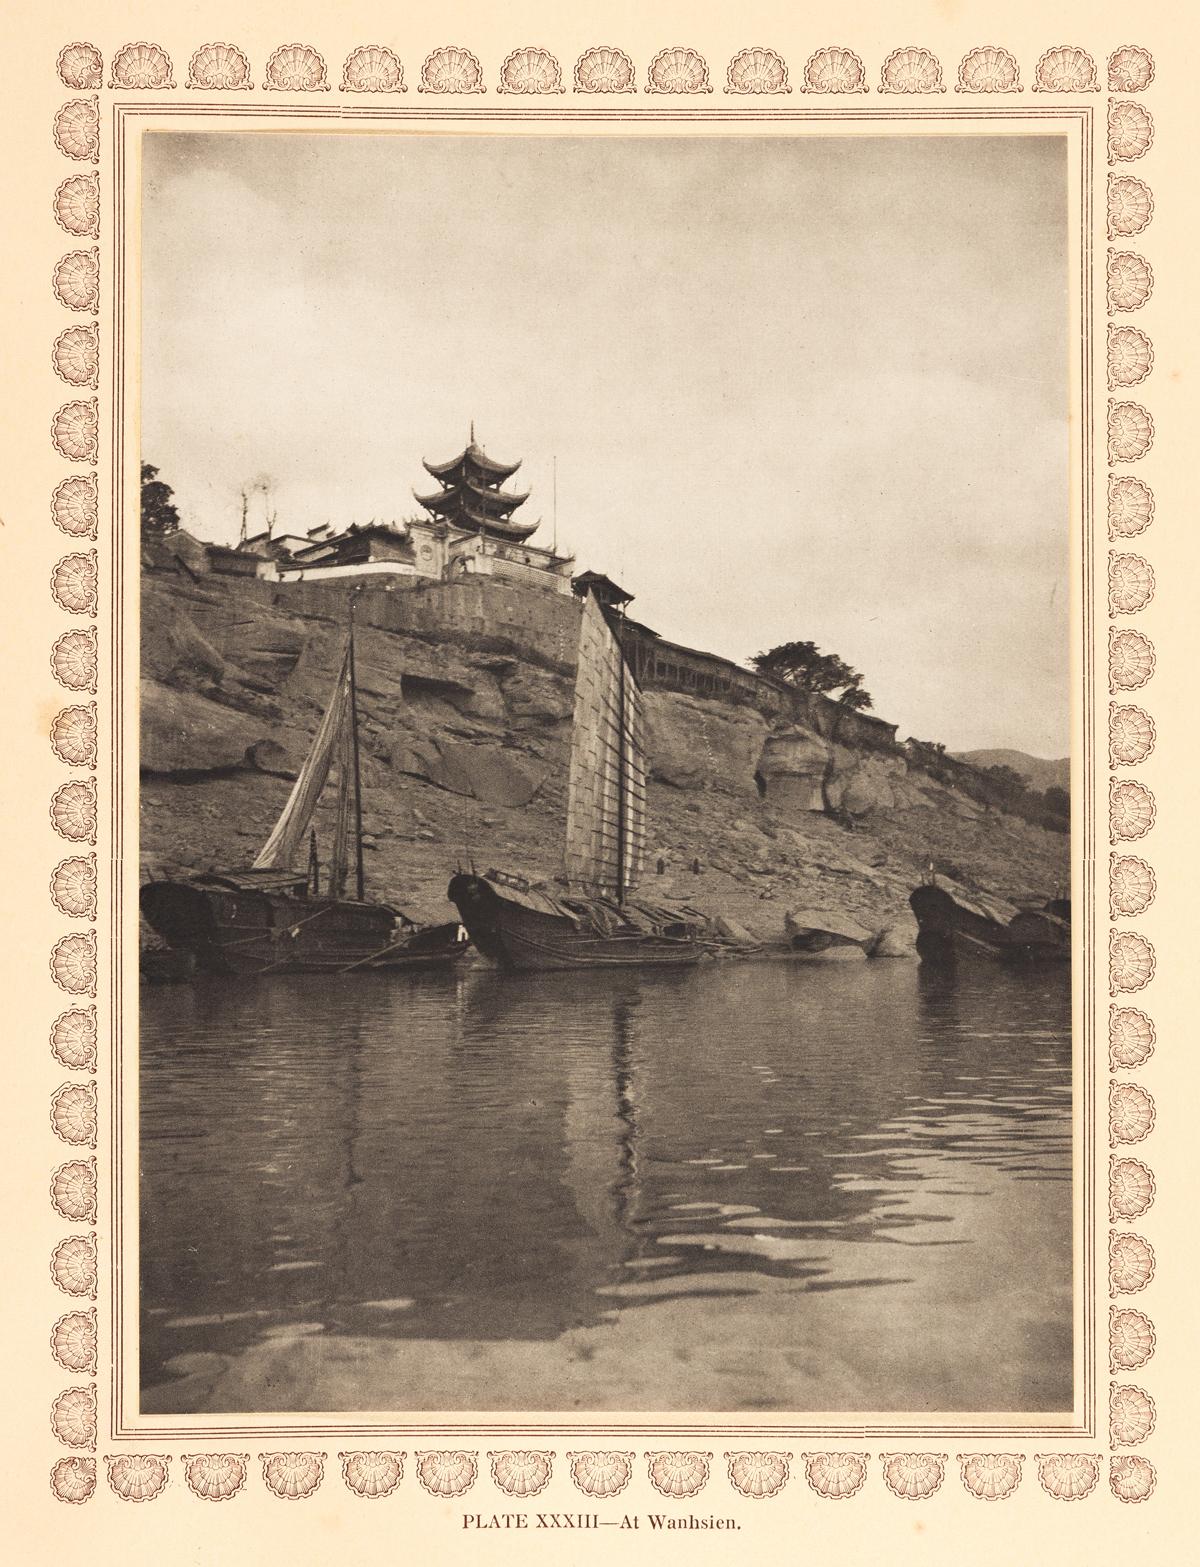 DONALD MENNIE. The Grandeur of the Gorges of the Yangtze.